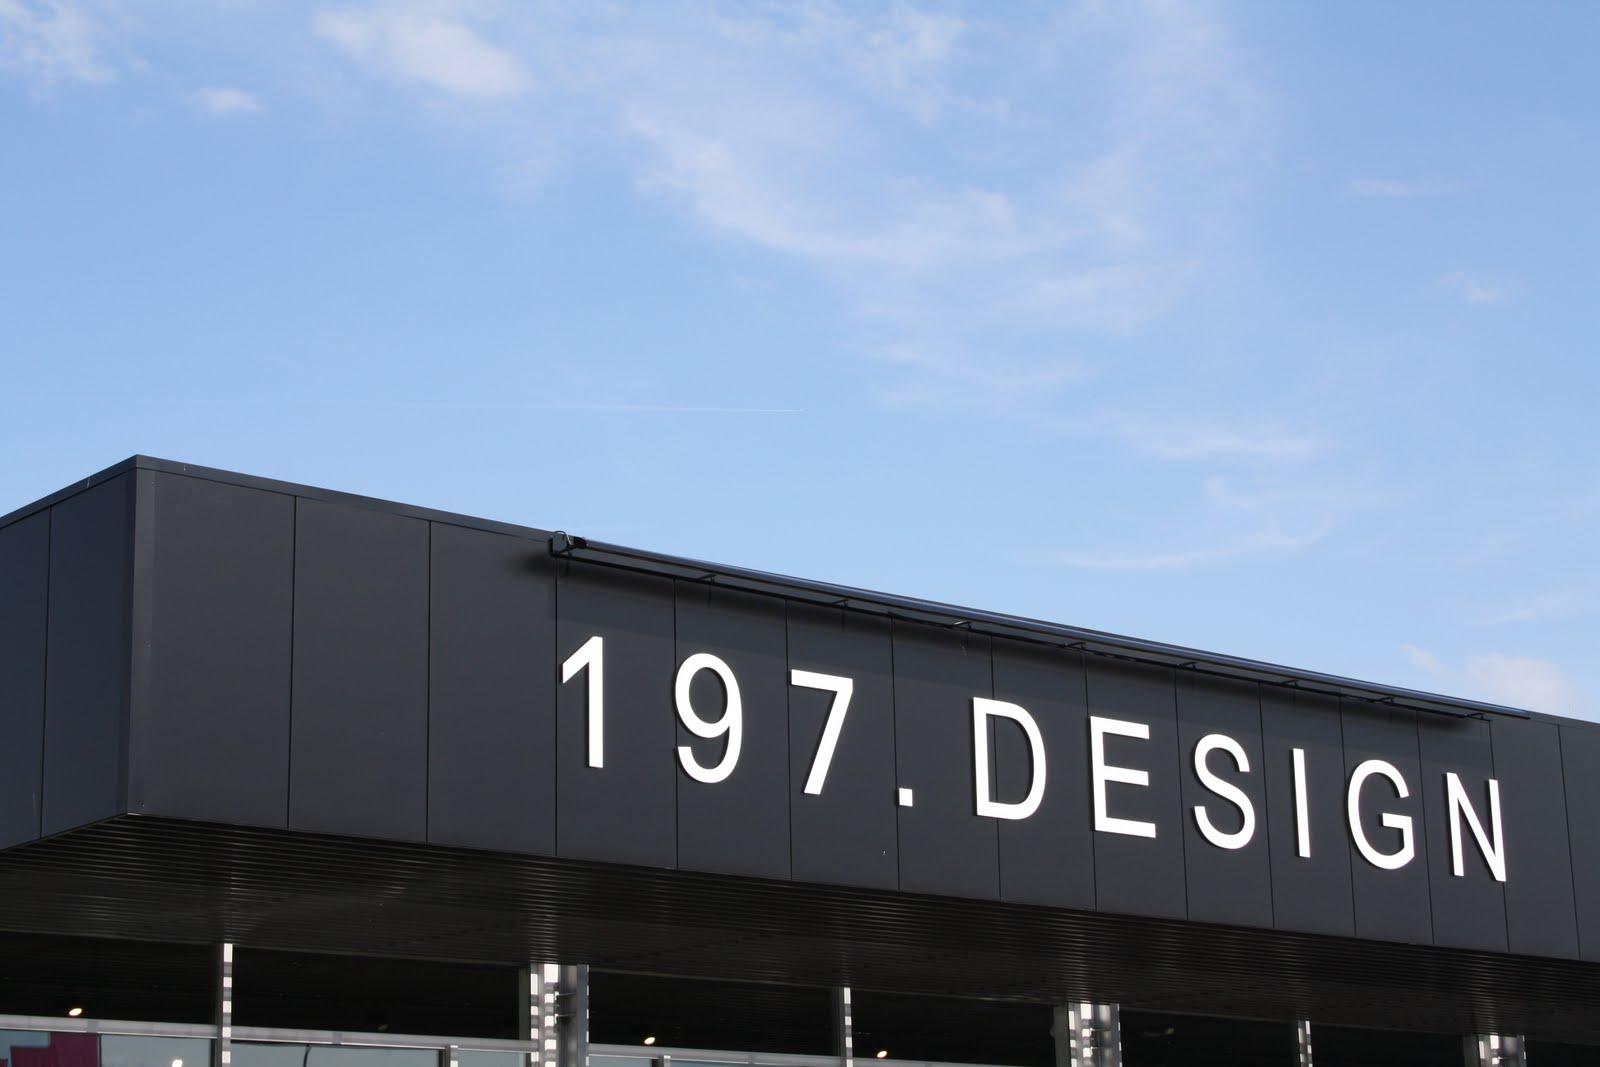 pierre muckensturm exposition chez 197 design strasbourg brumath. Black Bedroom Furniture Sets. Home Design Ideas